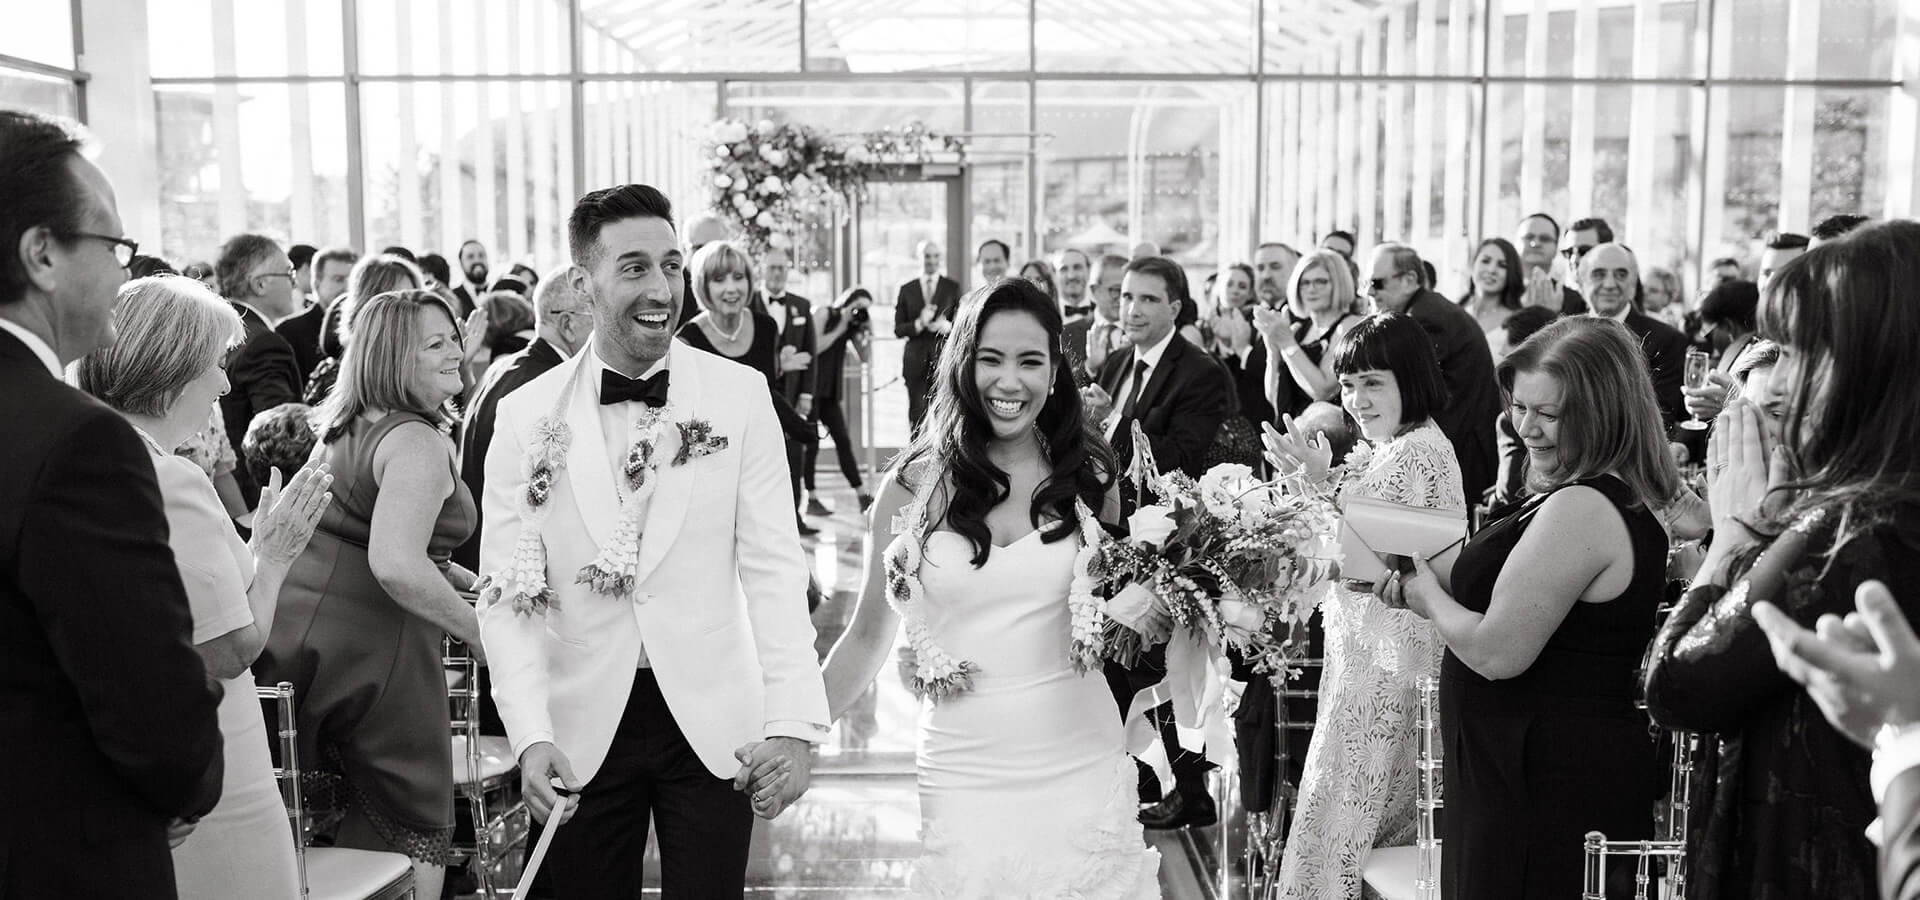 Hero image for Anita and Corey's Classic White Wedding at Toronto's Hotel X